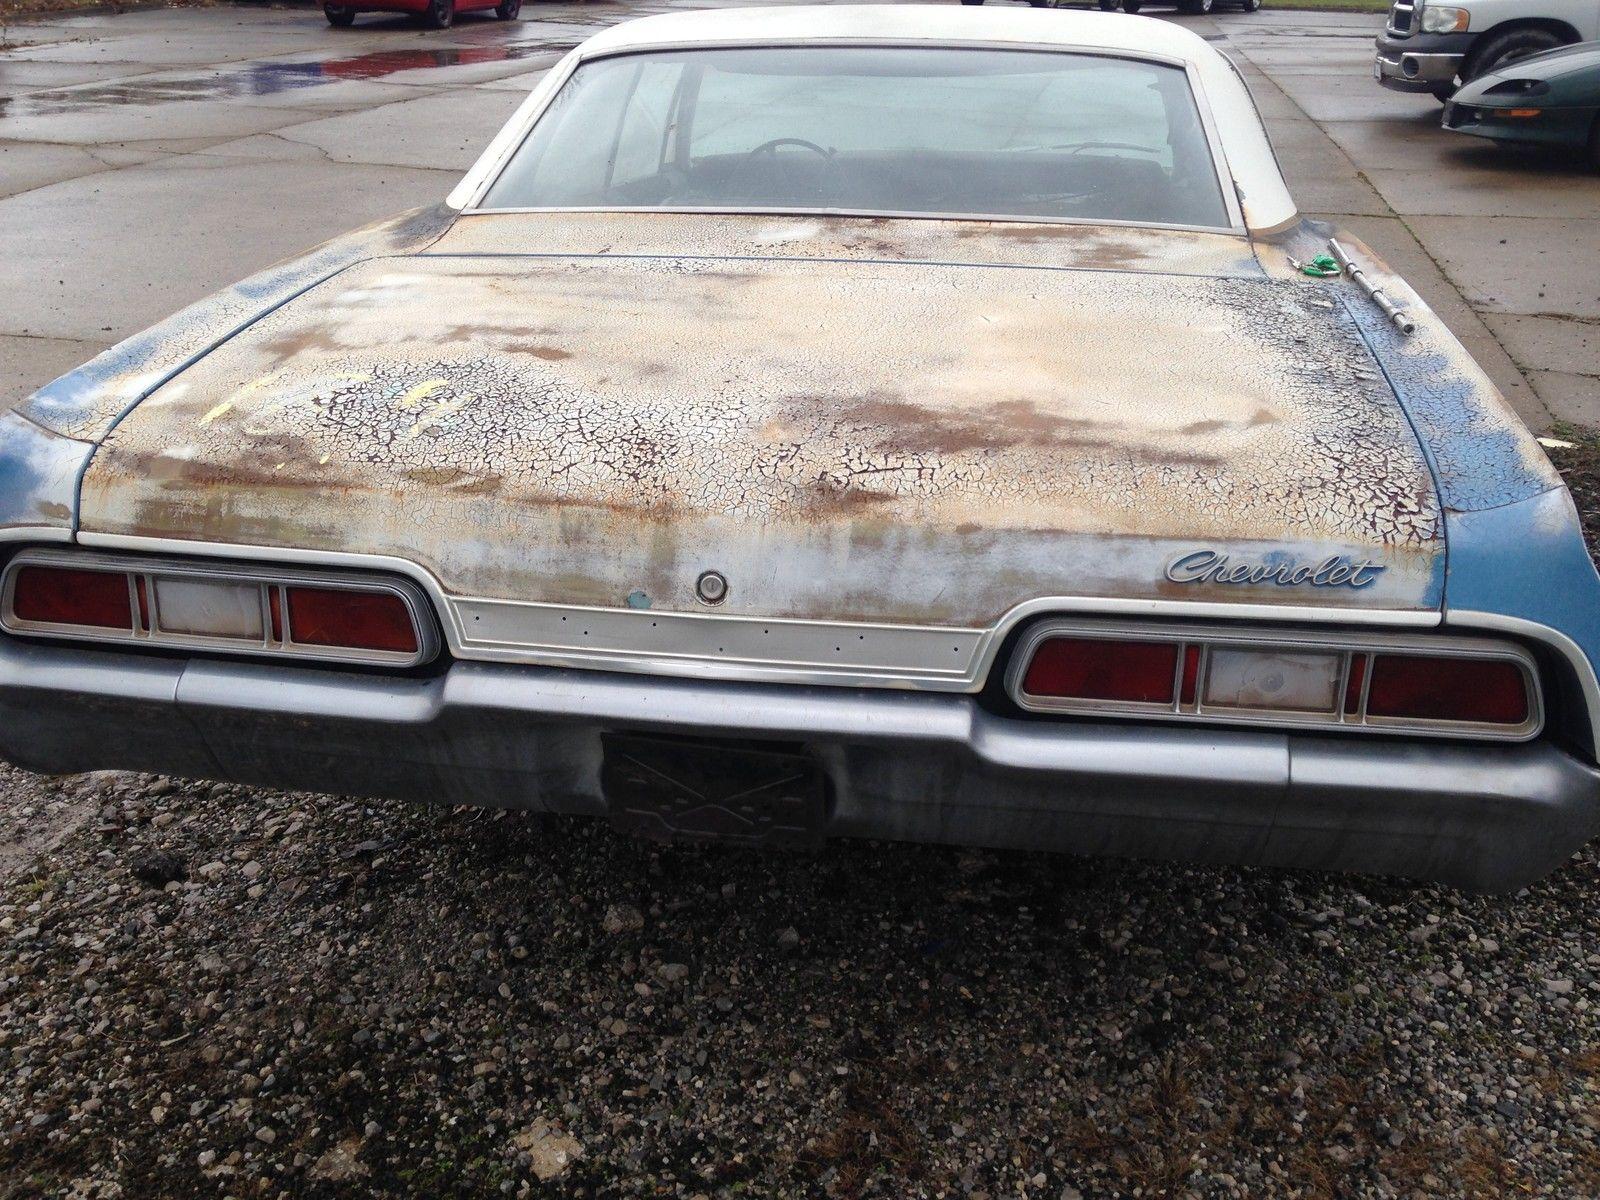 supernatural 1967 chevrolet impala 327 4 door hardtop classic chevrolet impala 1967 for sale. Black Bedroom Furniture Sets. Home Design Ideas